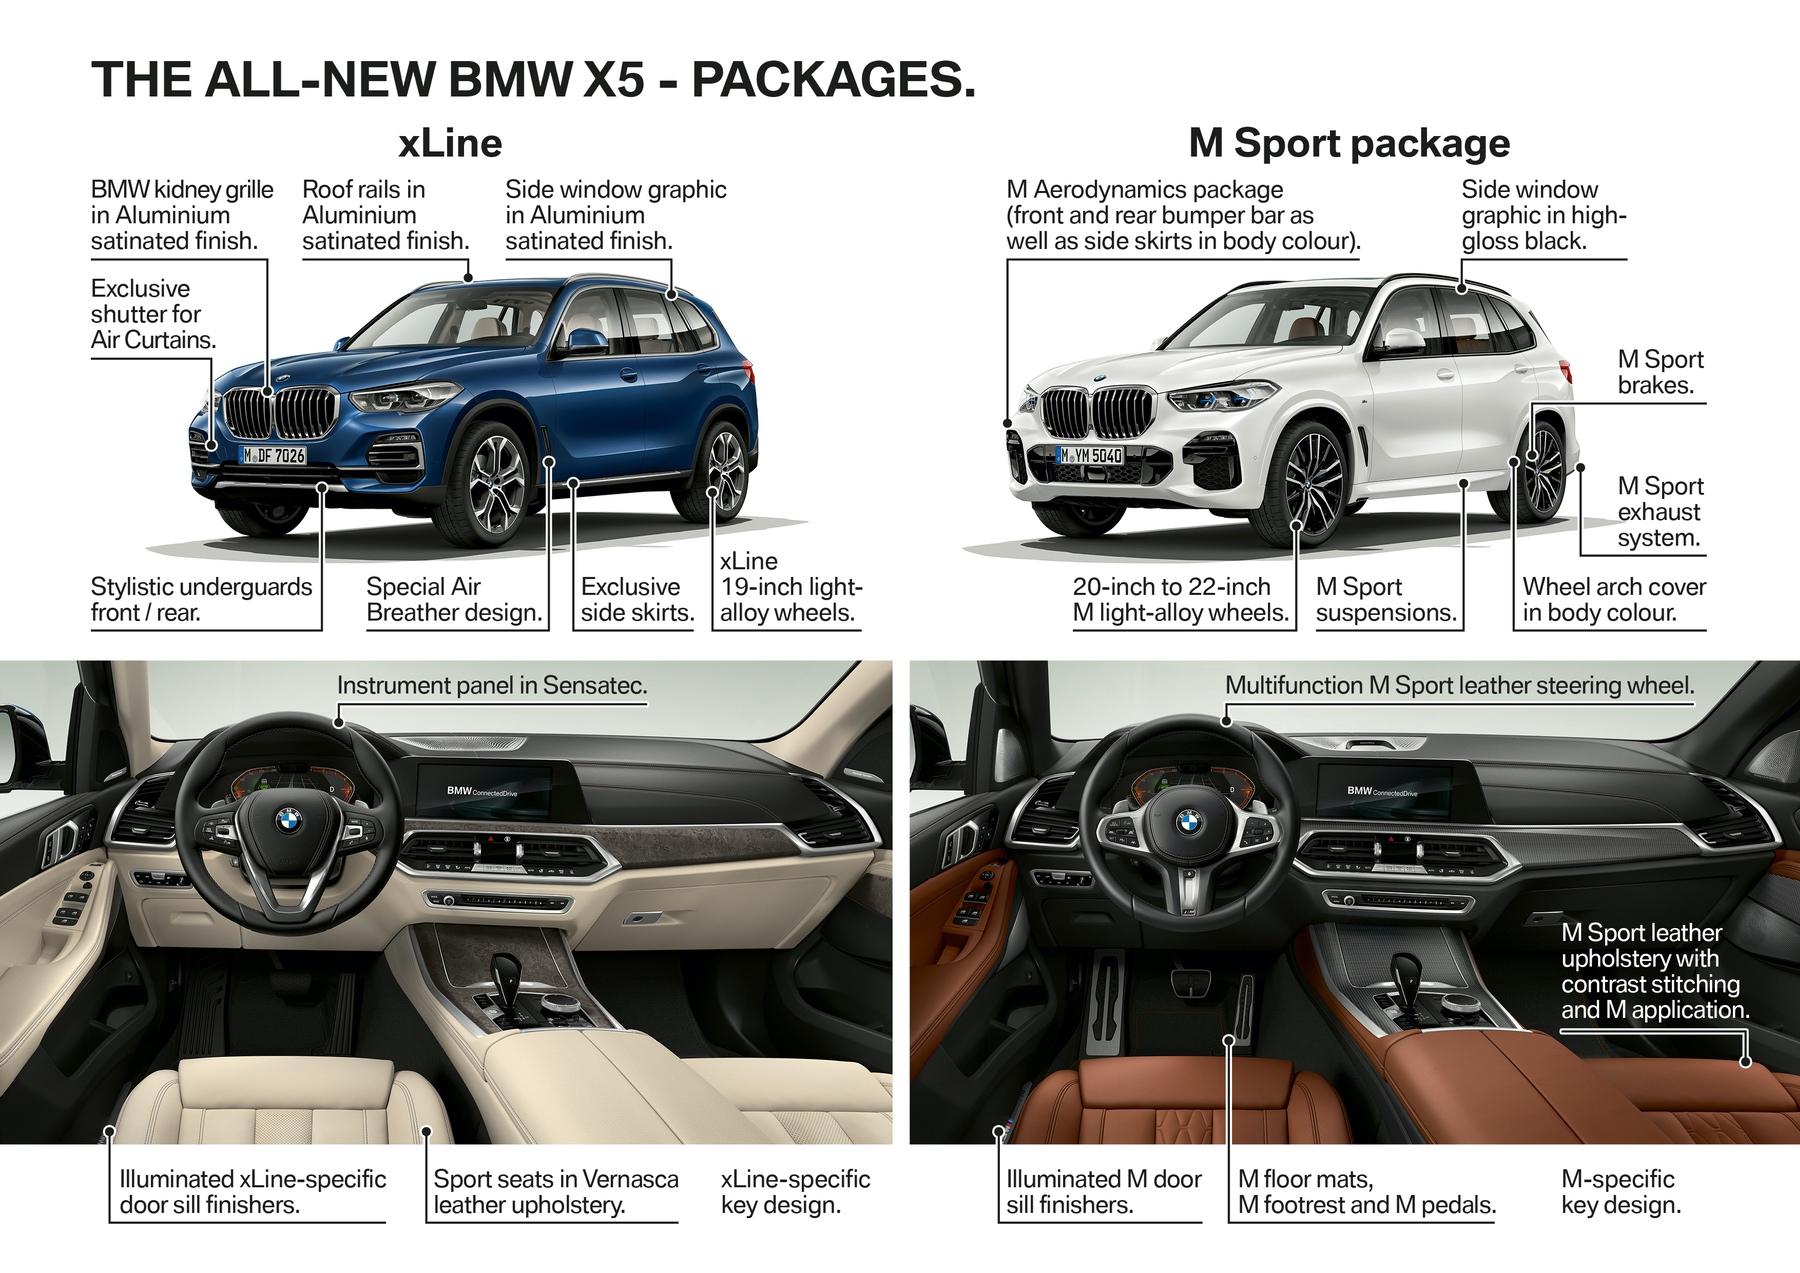 Comparison All New 2019 Bmw X5 Vs The Old X5s Bimmerfile